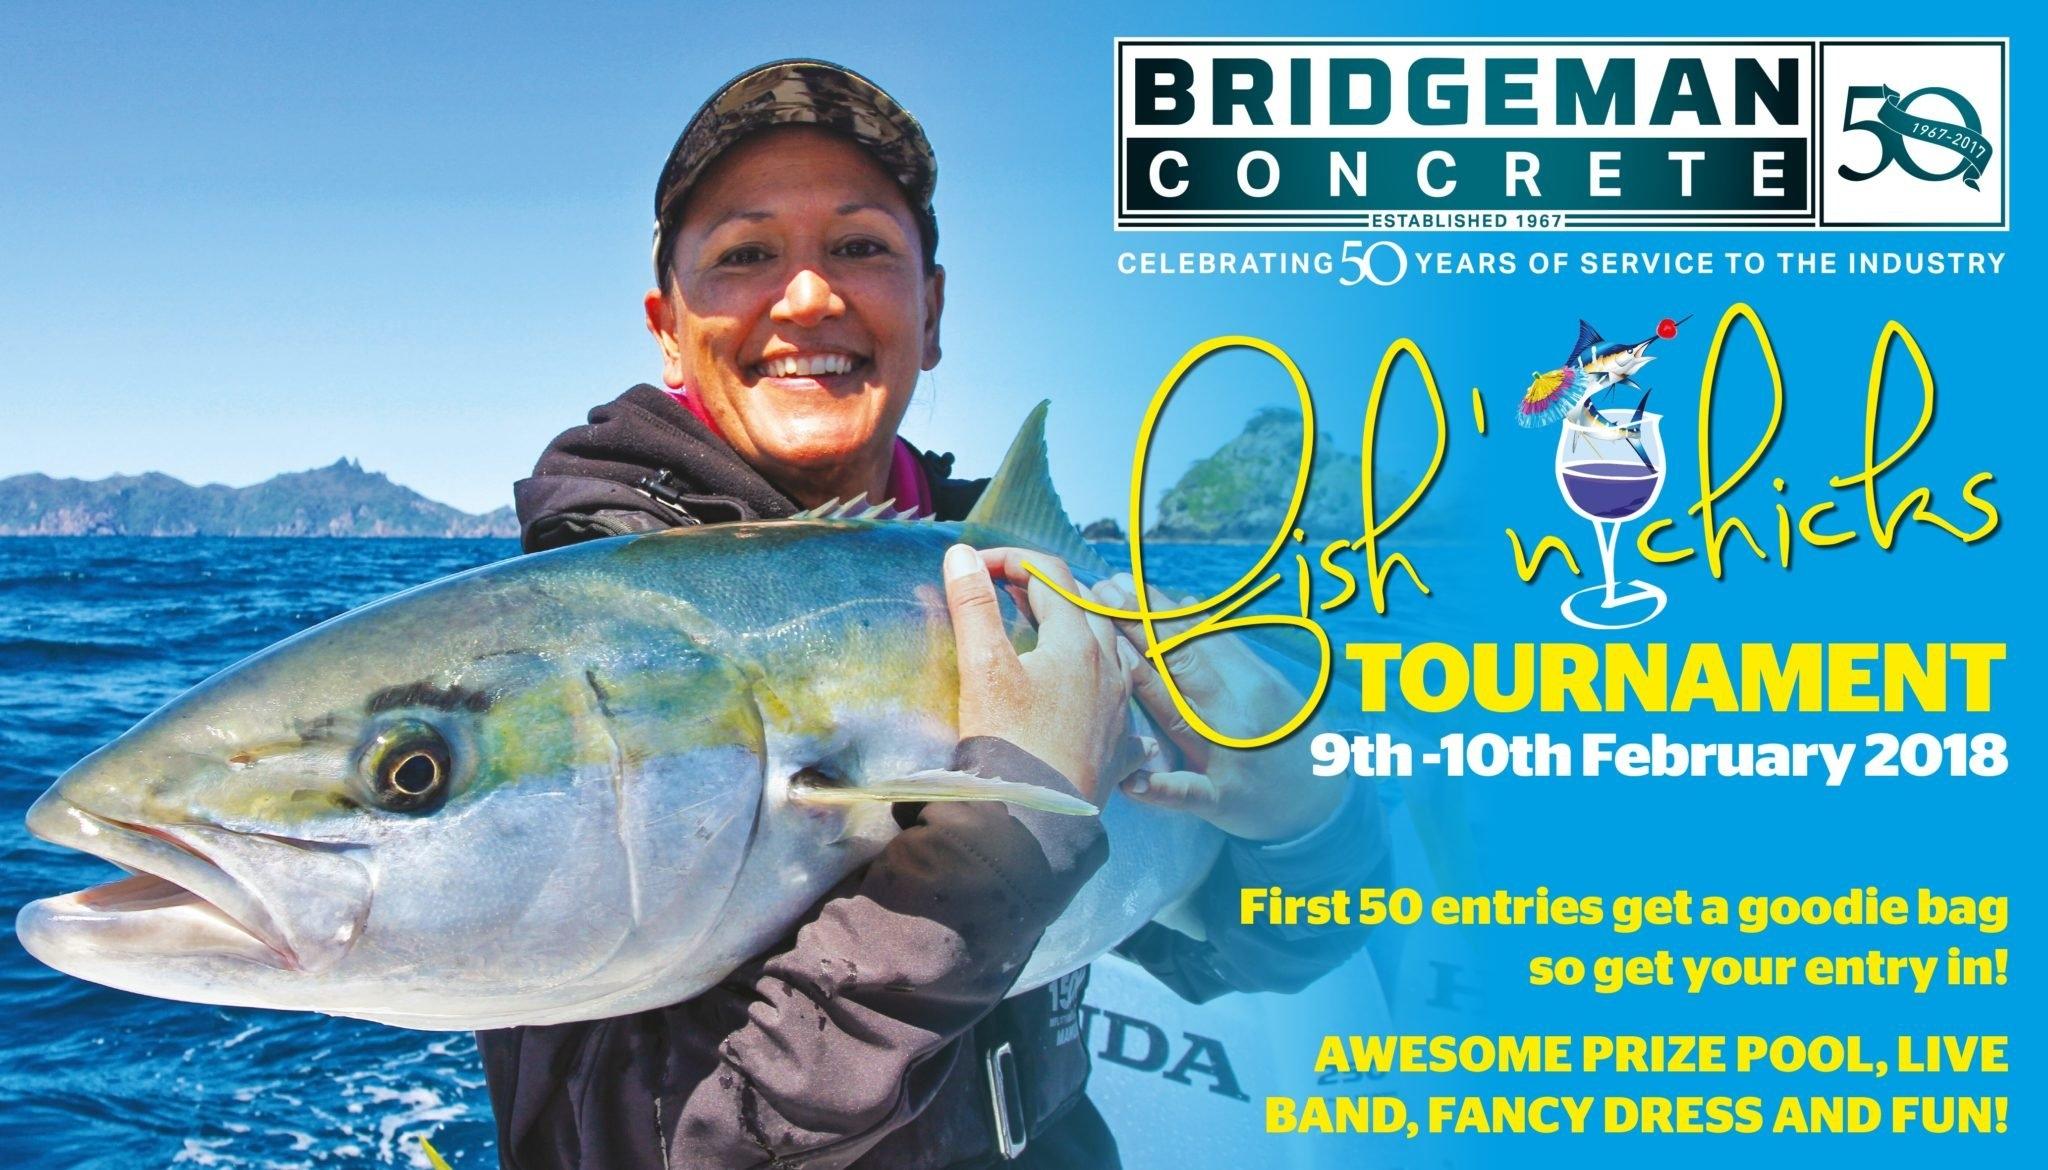 Bridgeman Concrete Fish N Chicks Tournament 2018 – Tauranga Sport Fish N Chix Calendar 2019